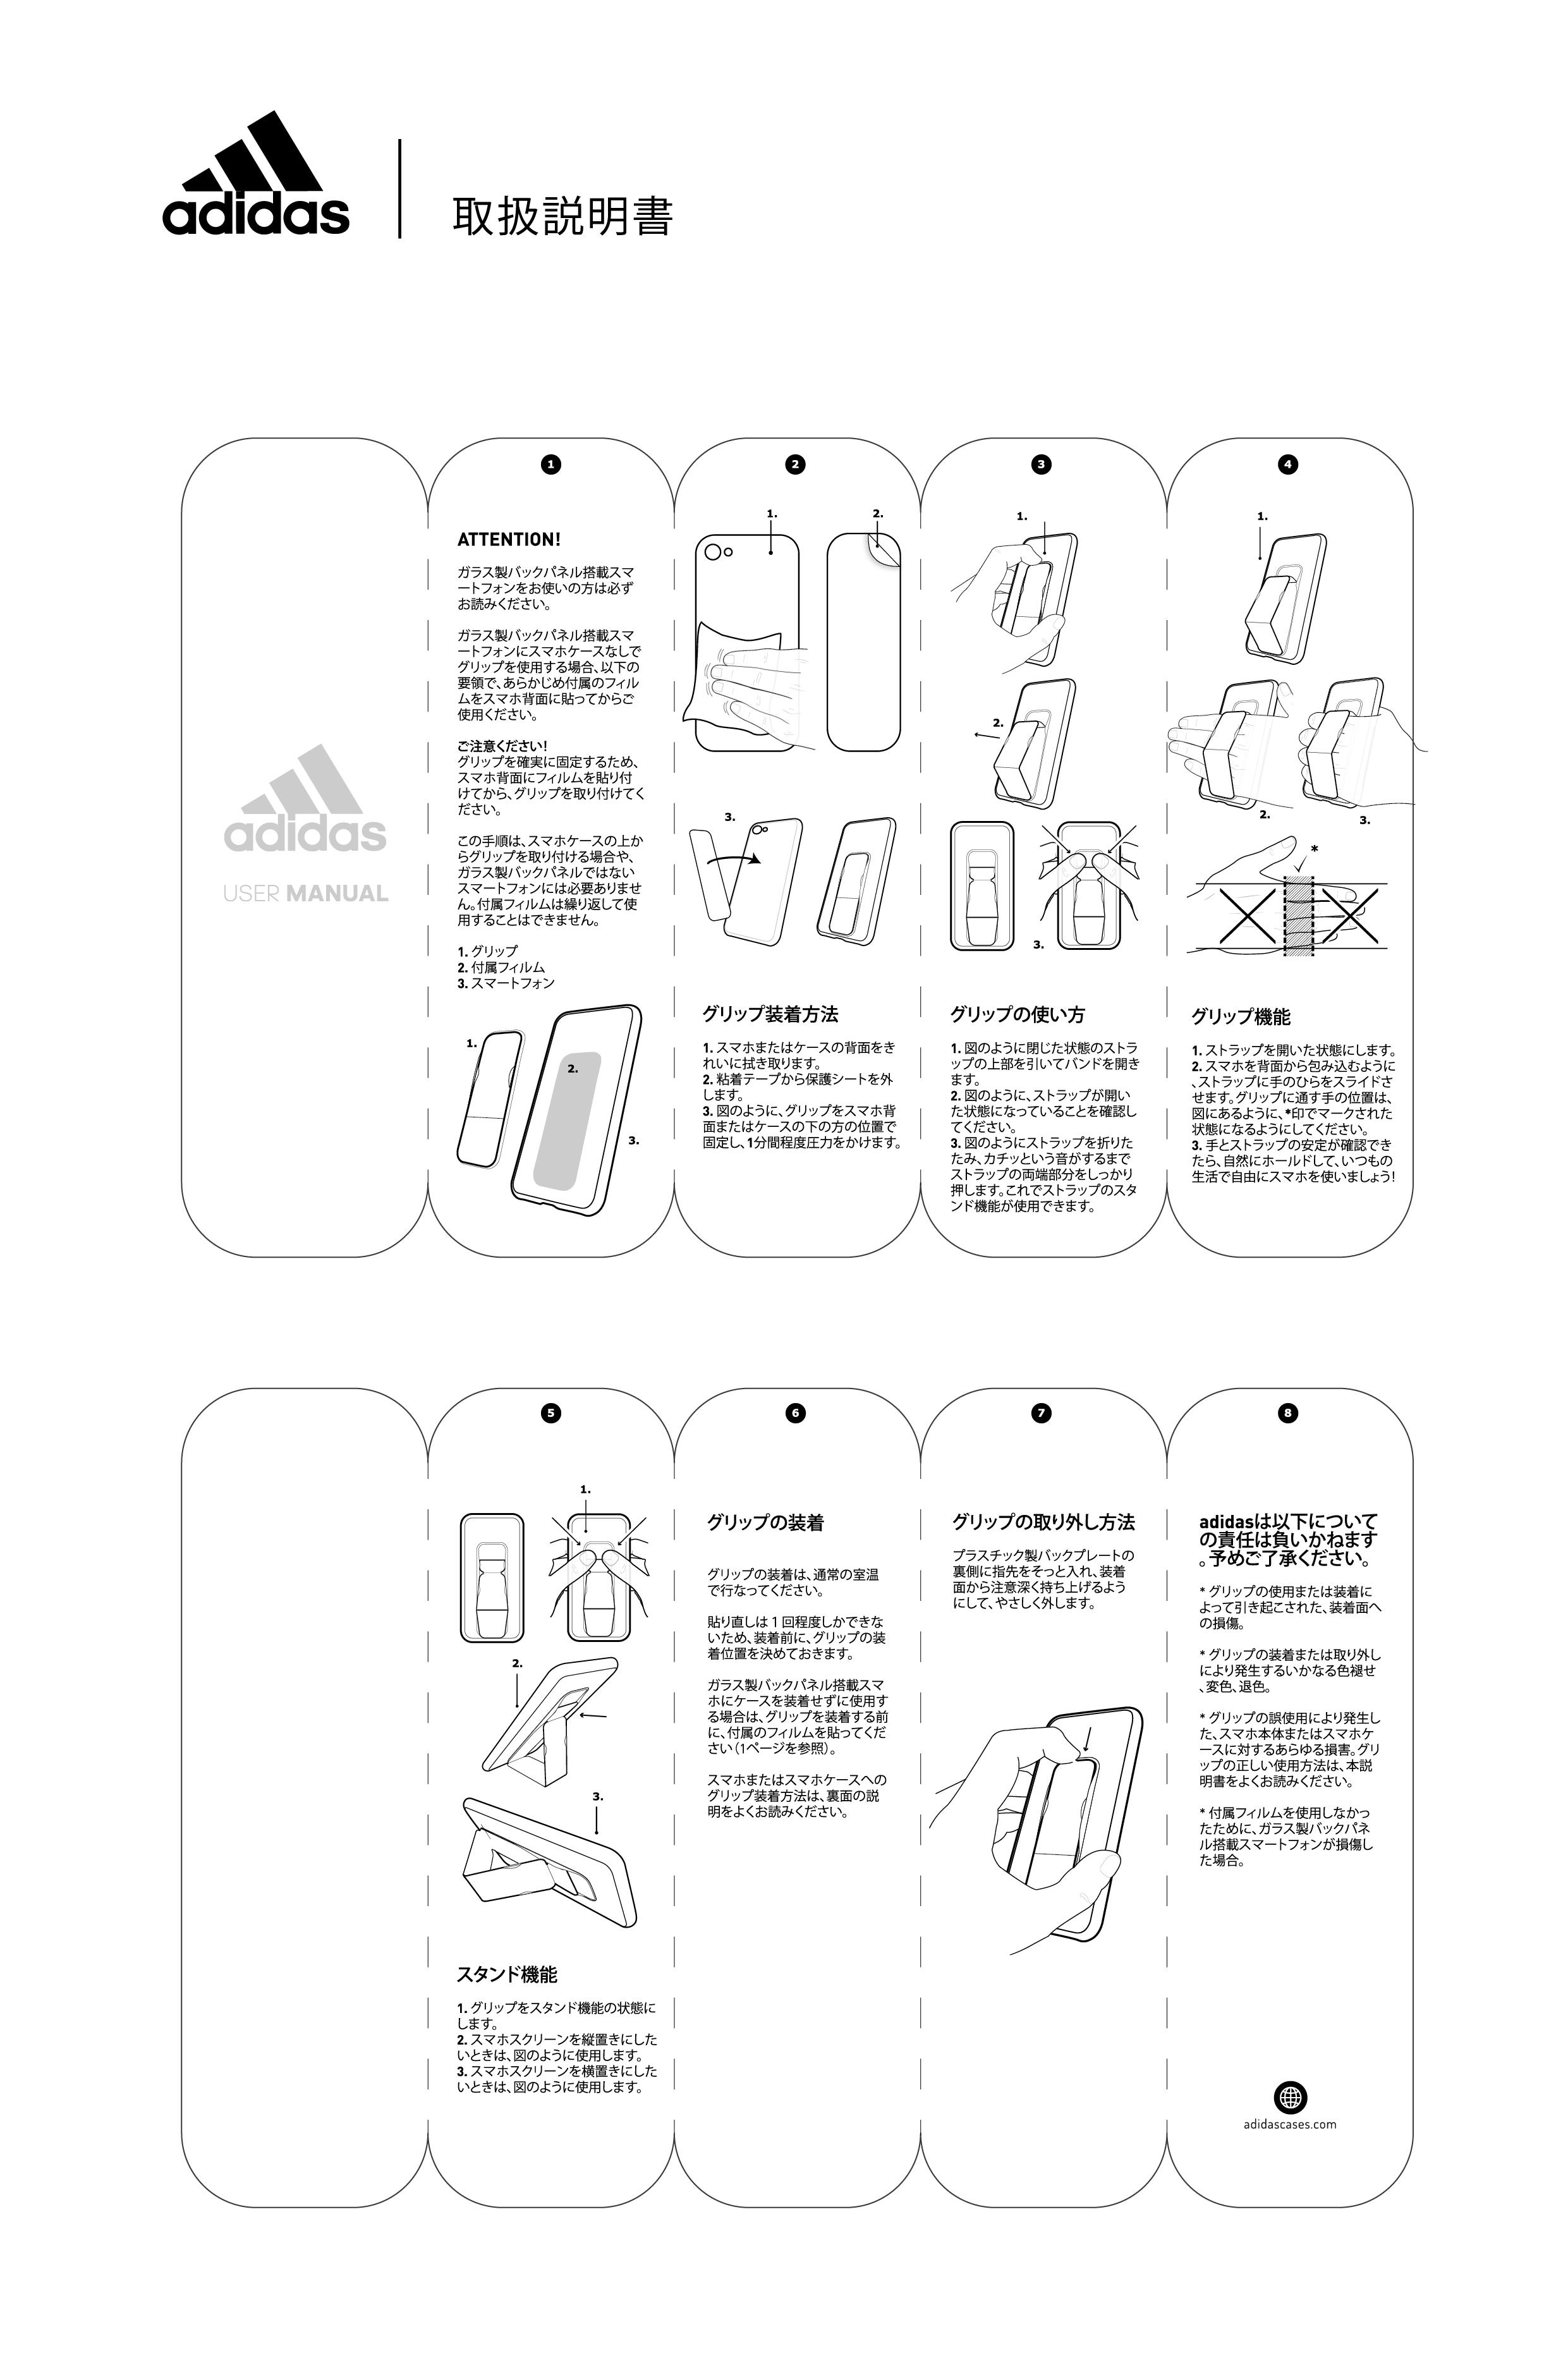 cordura marca borgoña  Manual Universal Grip adidas - Japanese : Help Center - adidascases.com -  Telecom Lifestyle Fashion